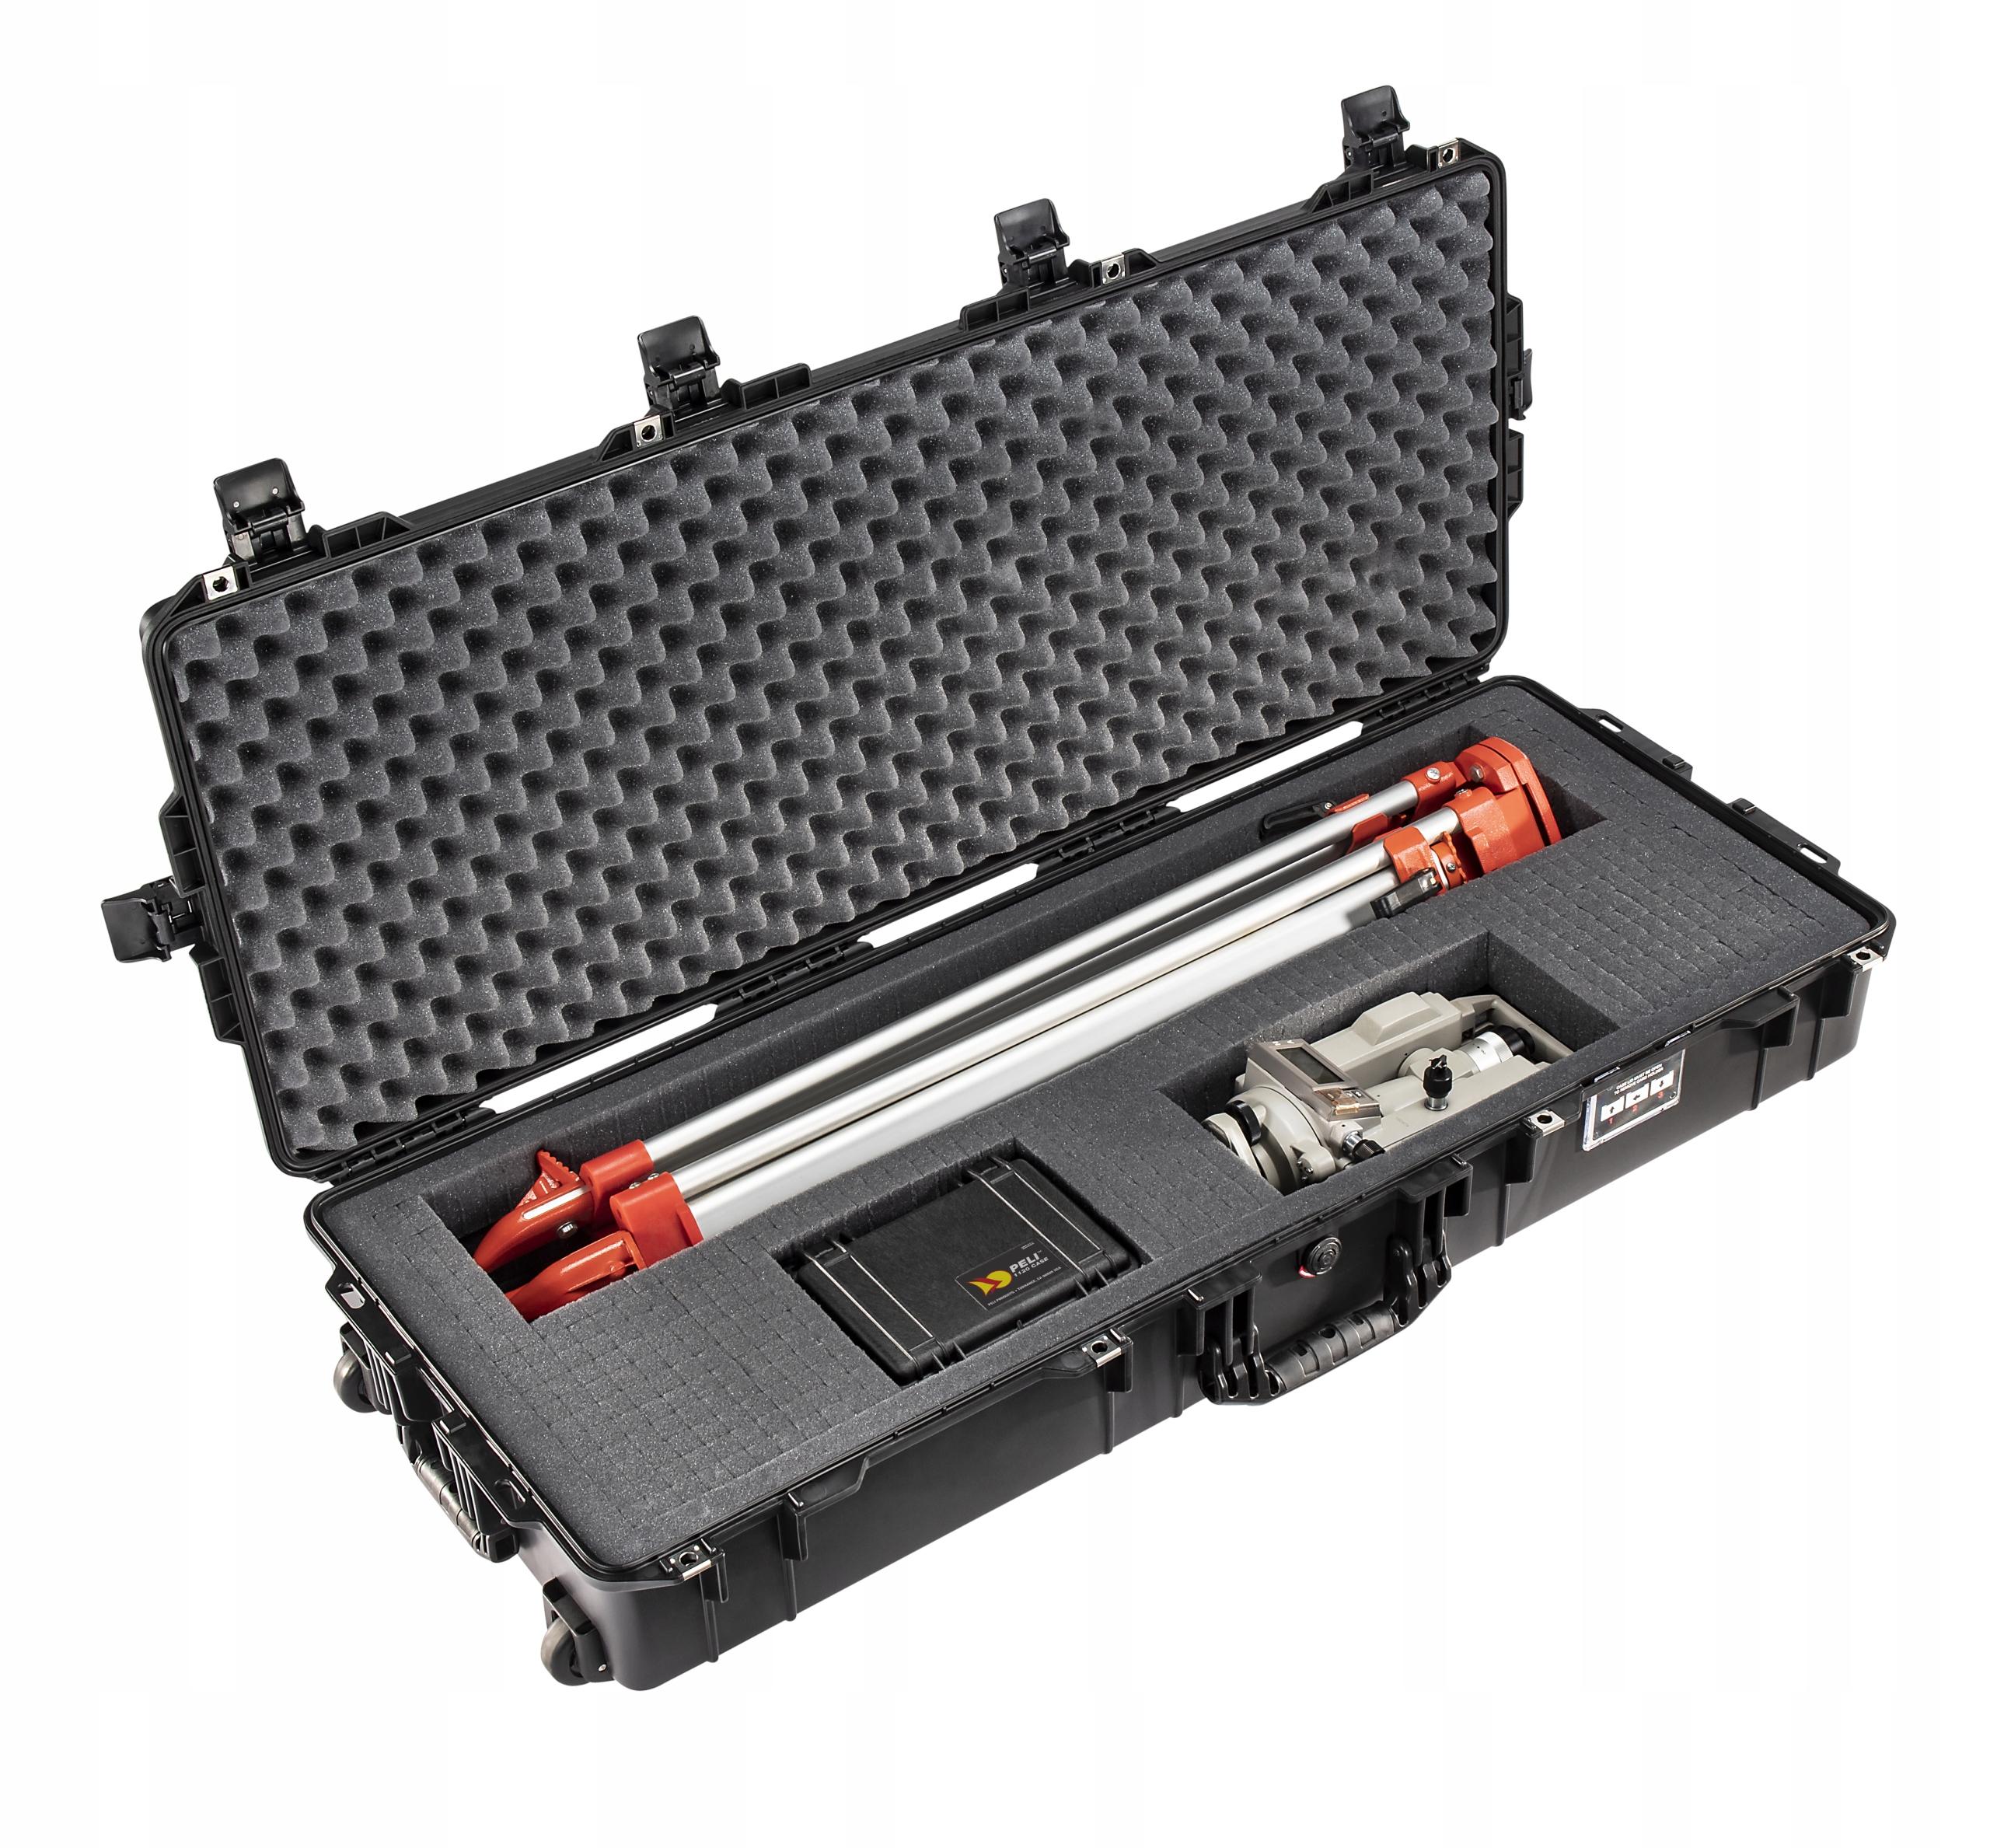 Peli Air Case 1745 skrzynka walizka na tachimetr